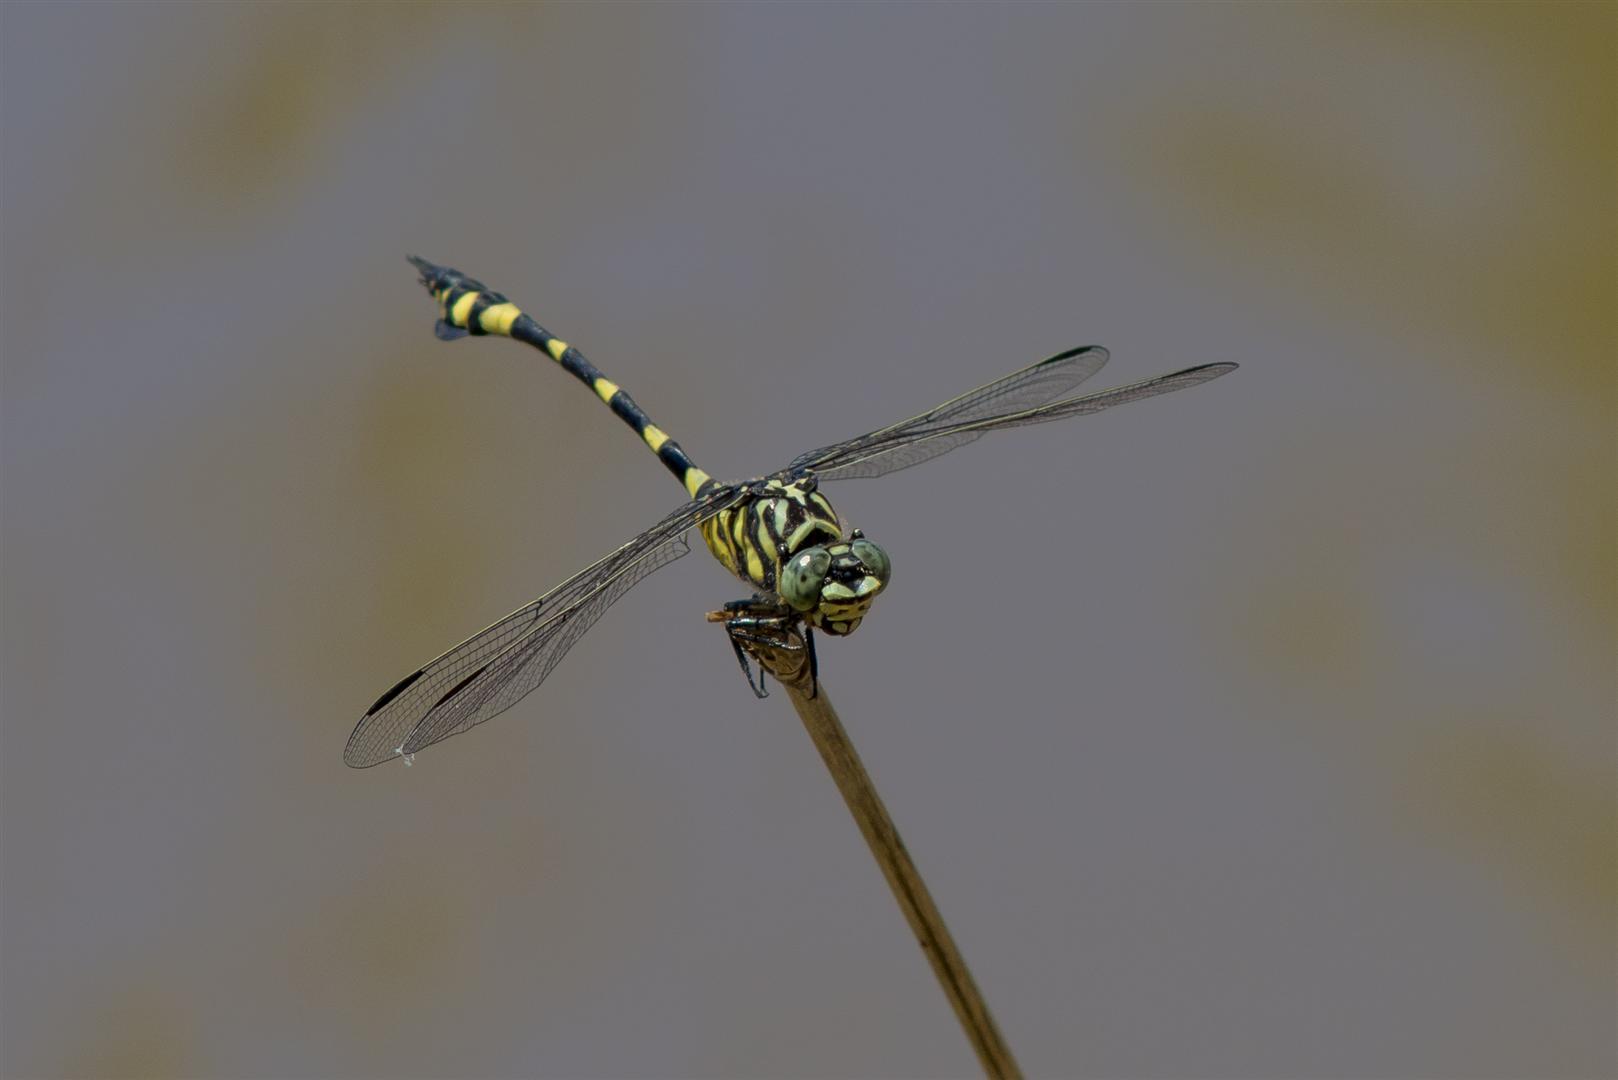 Dragonfly trip with Rod Hosbon, Al Young, Mark Weaver and Harry Ashdown. Murphys Bridge, Lockyer Creek. Australian Tiger, Ictinogomphus australis